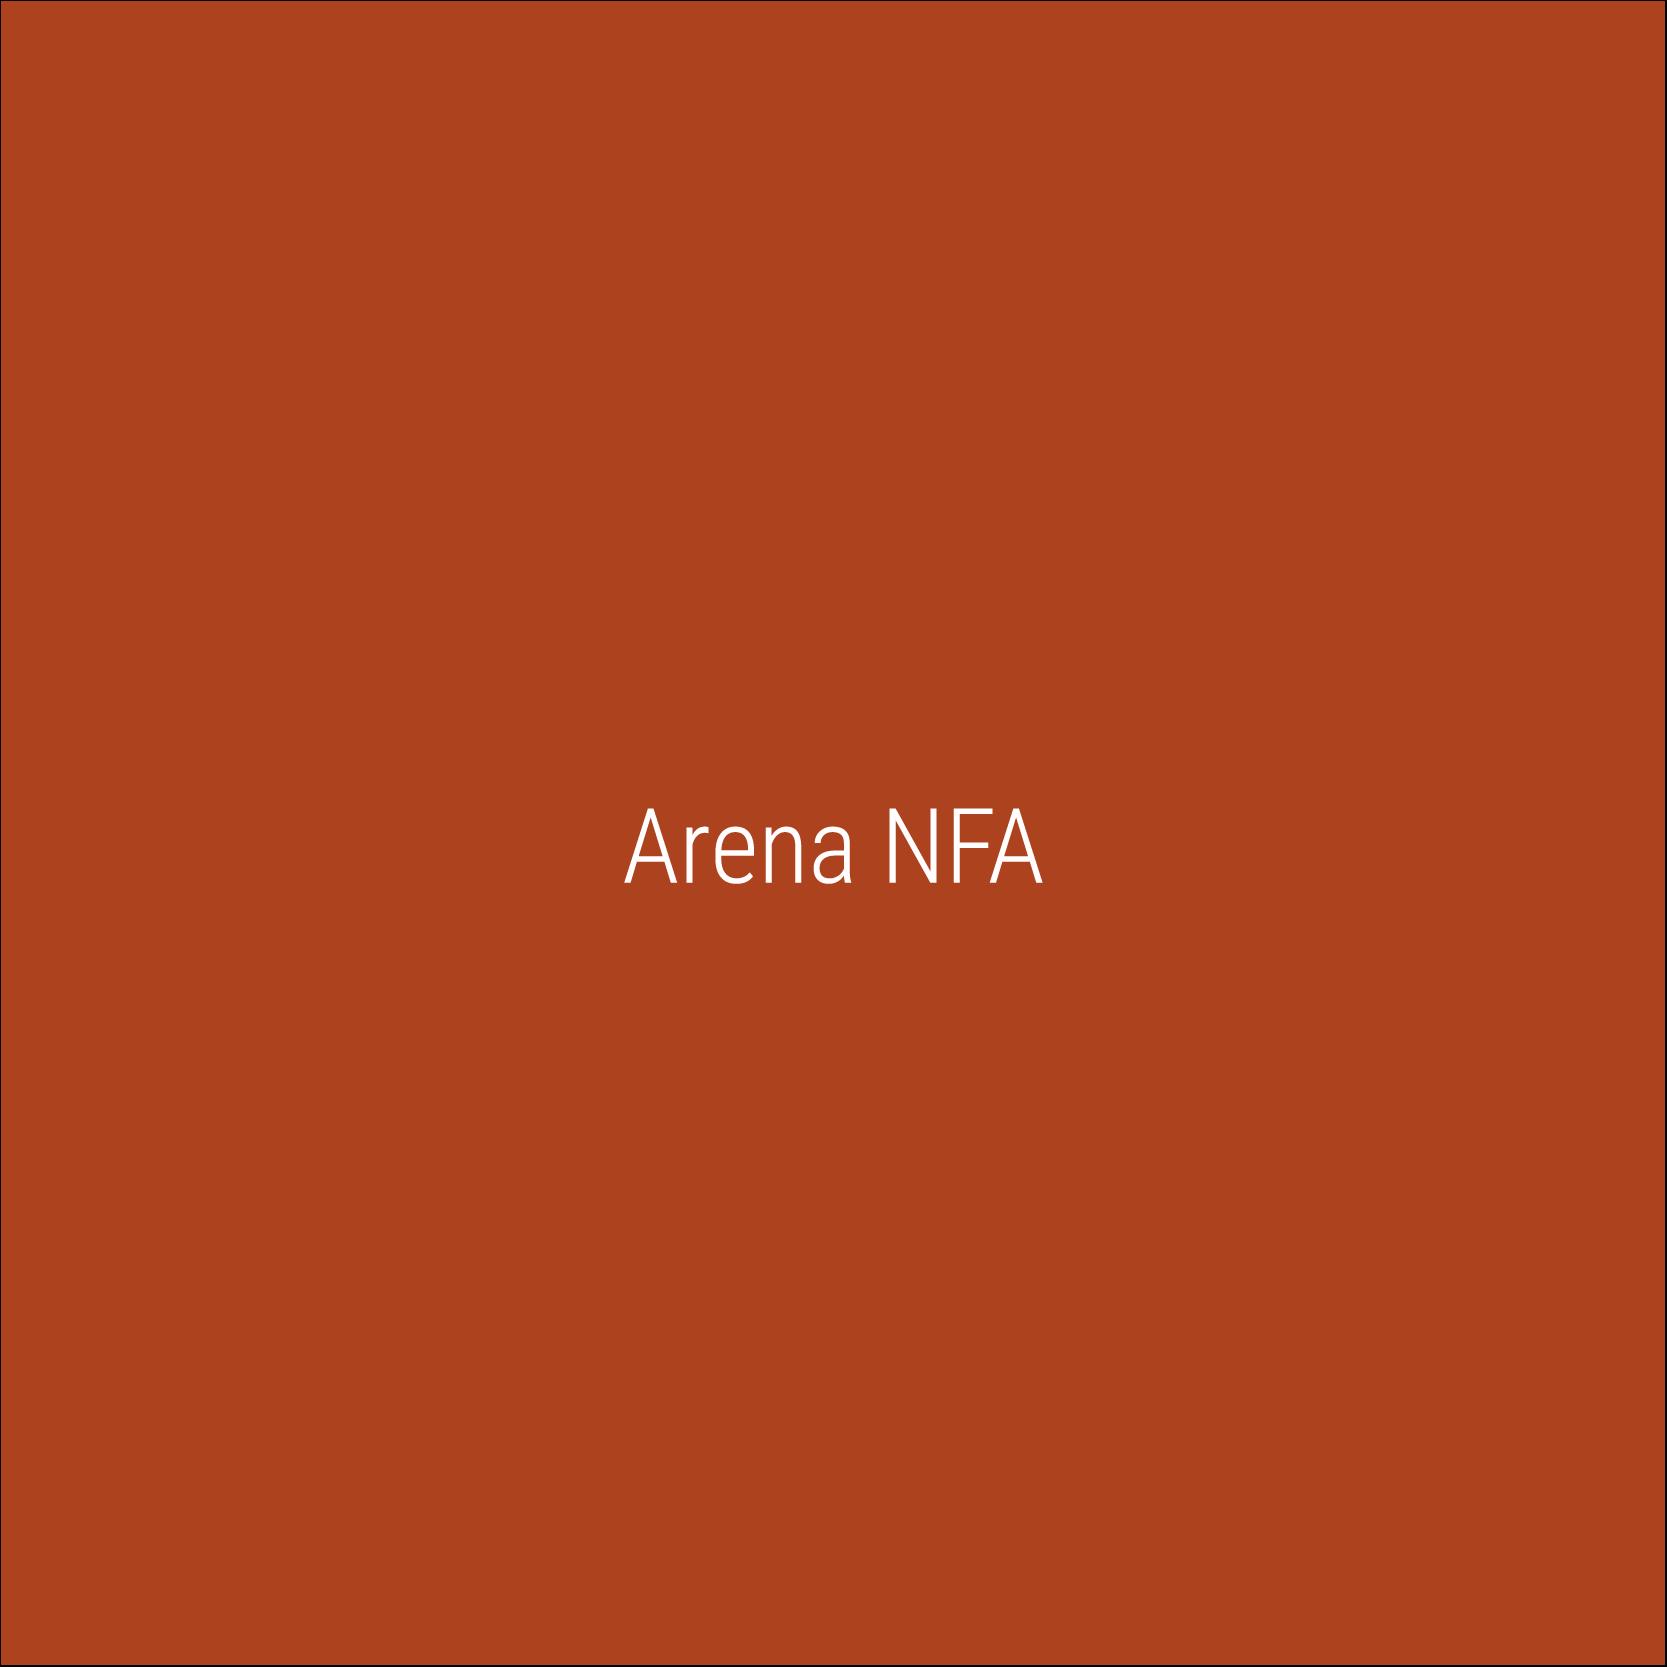 Arena NFA_Prancheta 1